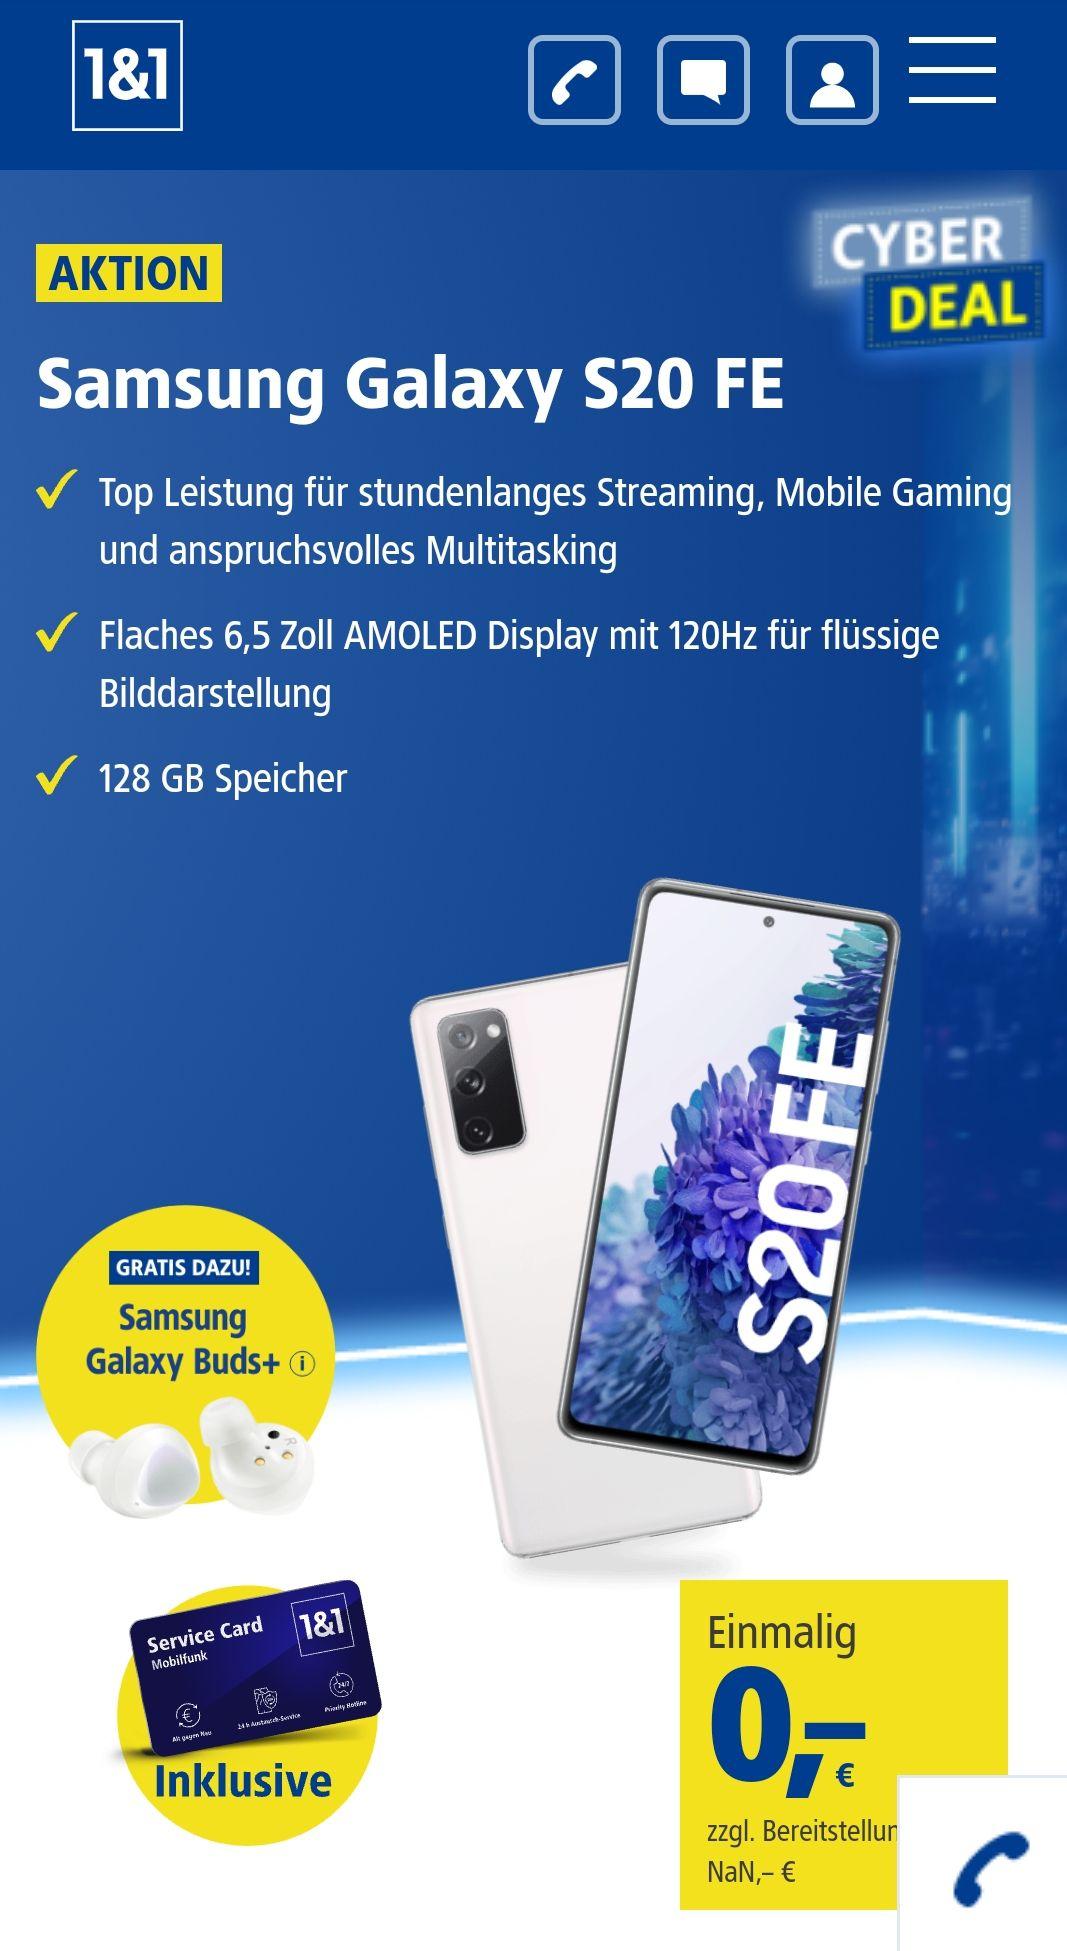 1&1 1 GB Vertrag mit Samsung Galaxy S20 FE inkl. Buds+